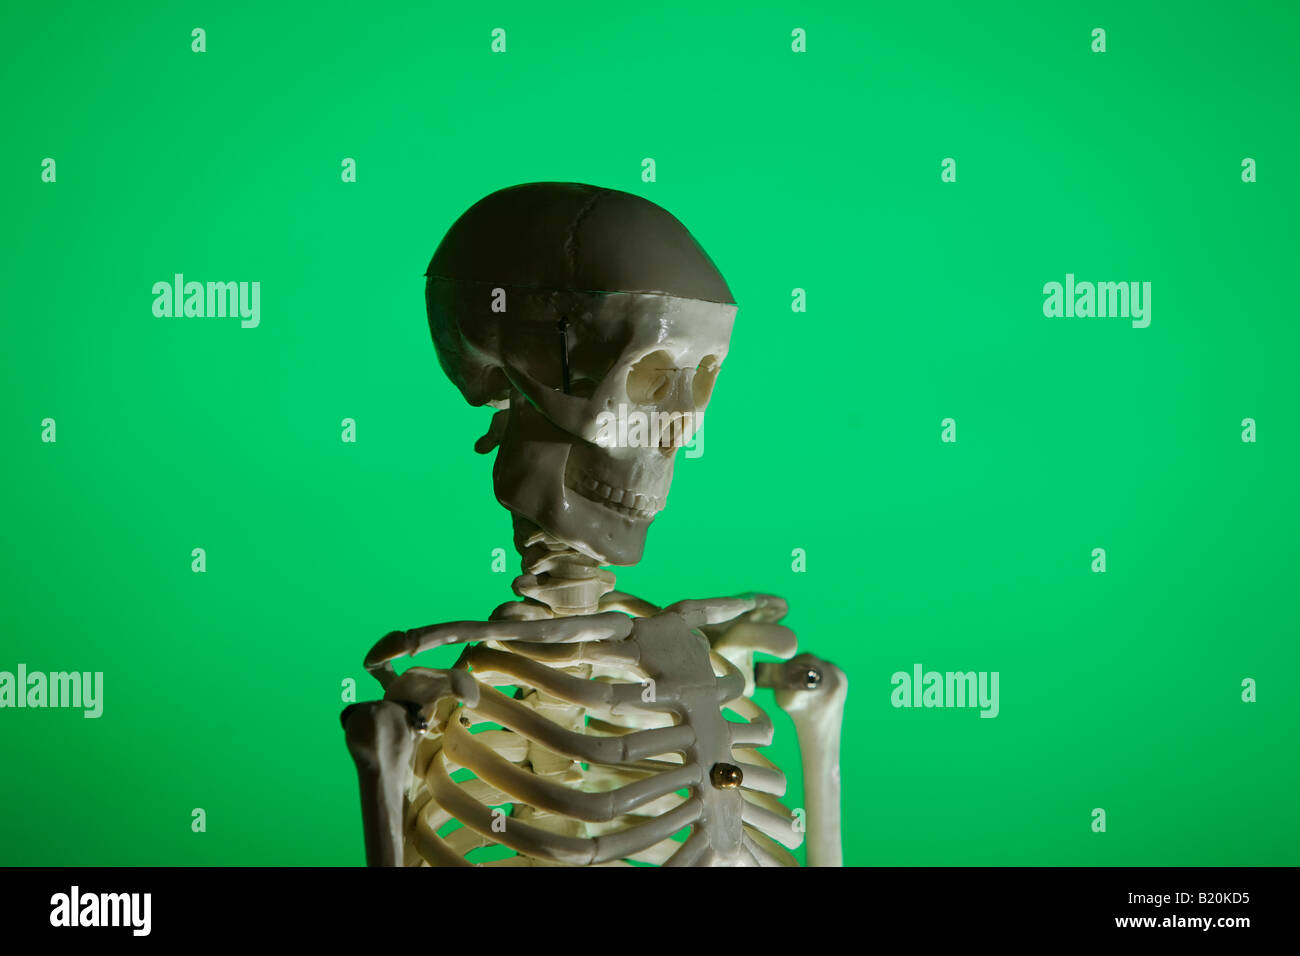 Human Skeleton Model Stock Photos & Human Skeleton Model Stock